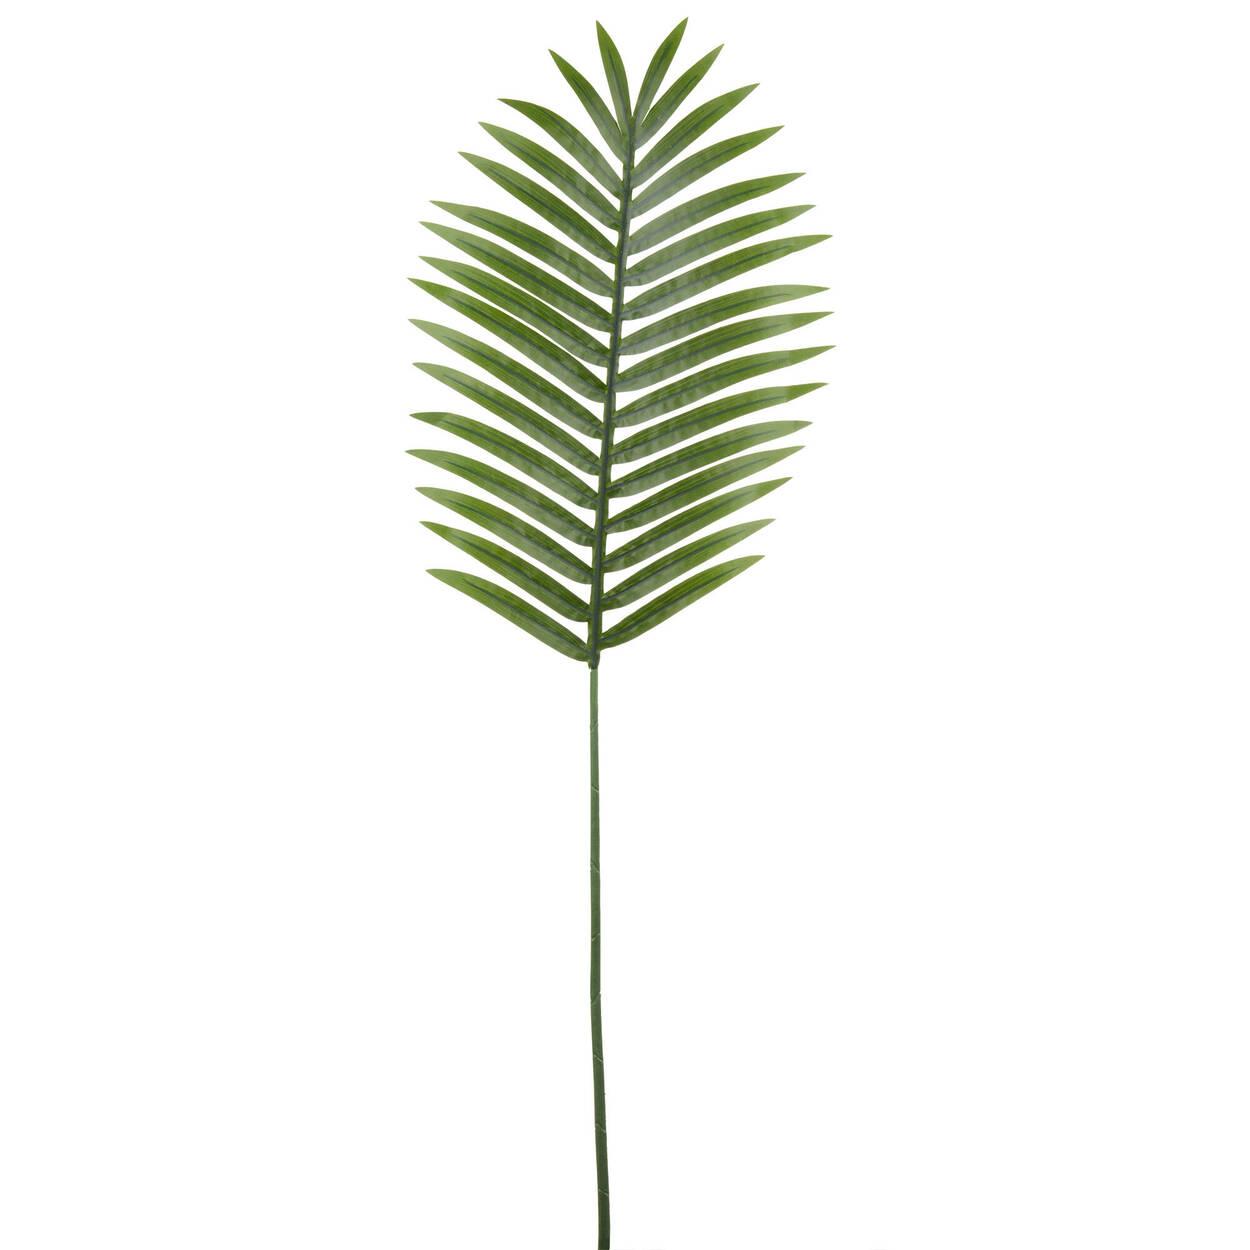 Verdure artificielle feuillle tropical